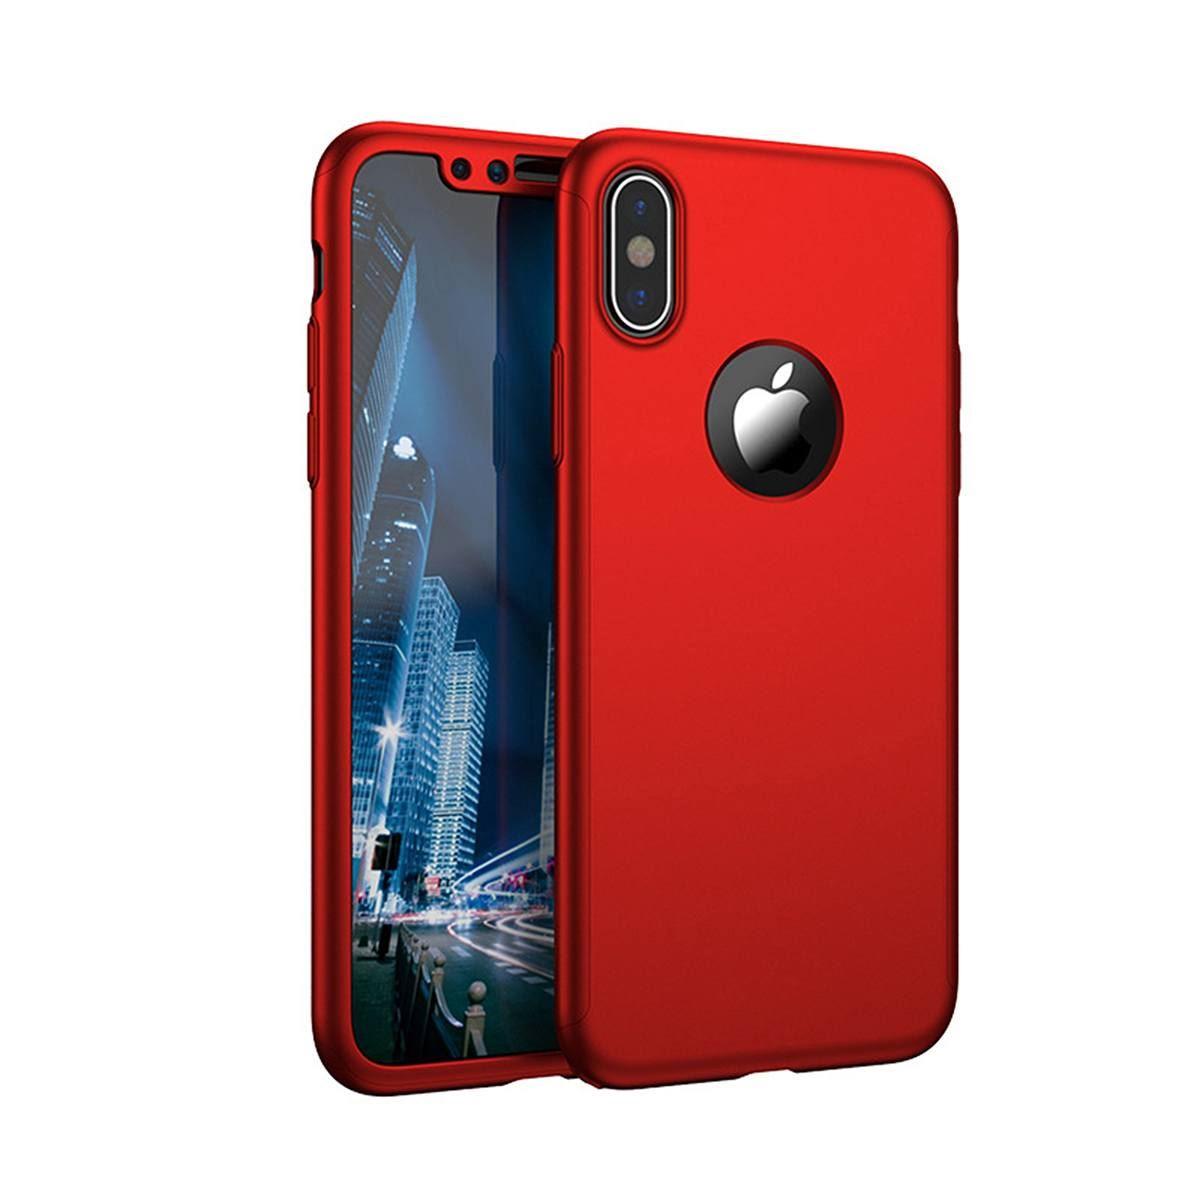 For-Apple-iPhone-XS-Max-XR-Hybrid-360-Slim-Ultra-Thin-Heavy-Duty-Shockproof-Case Indexbild 45